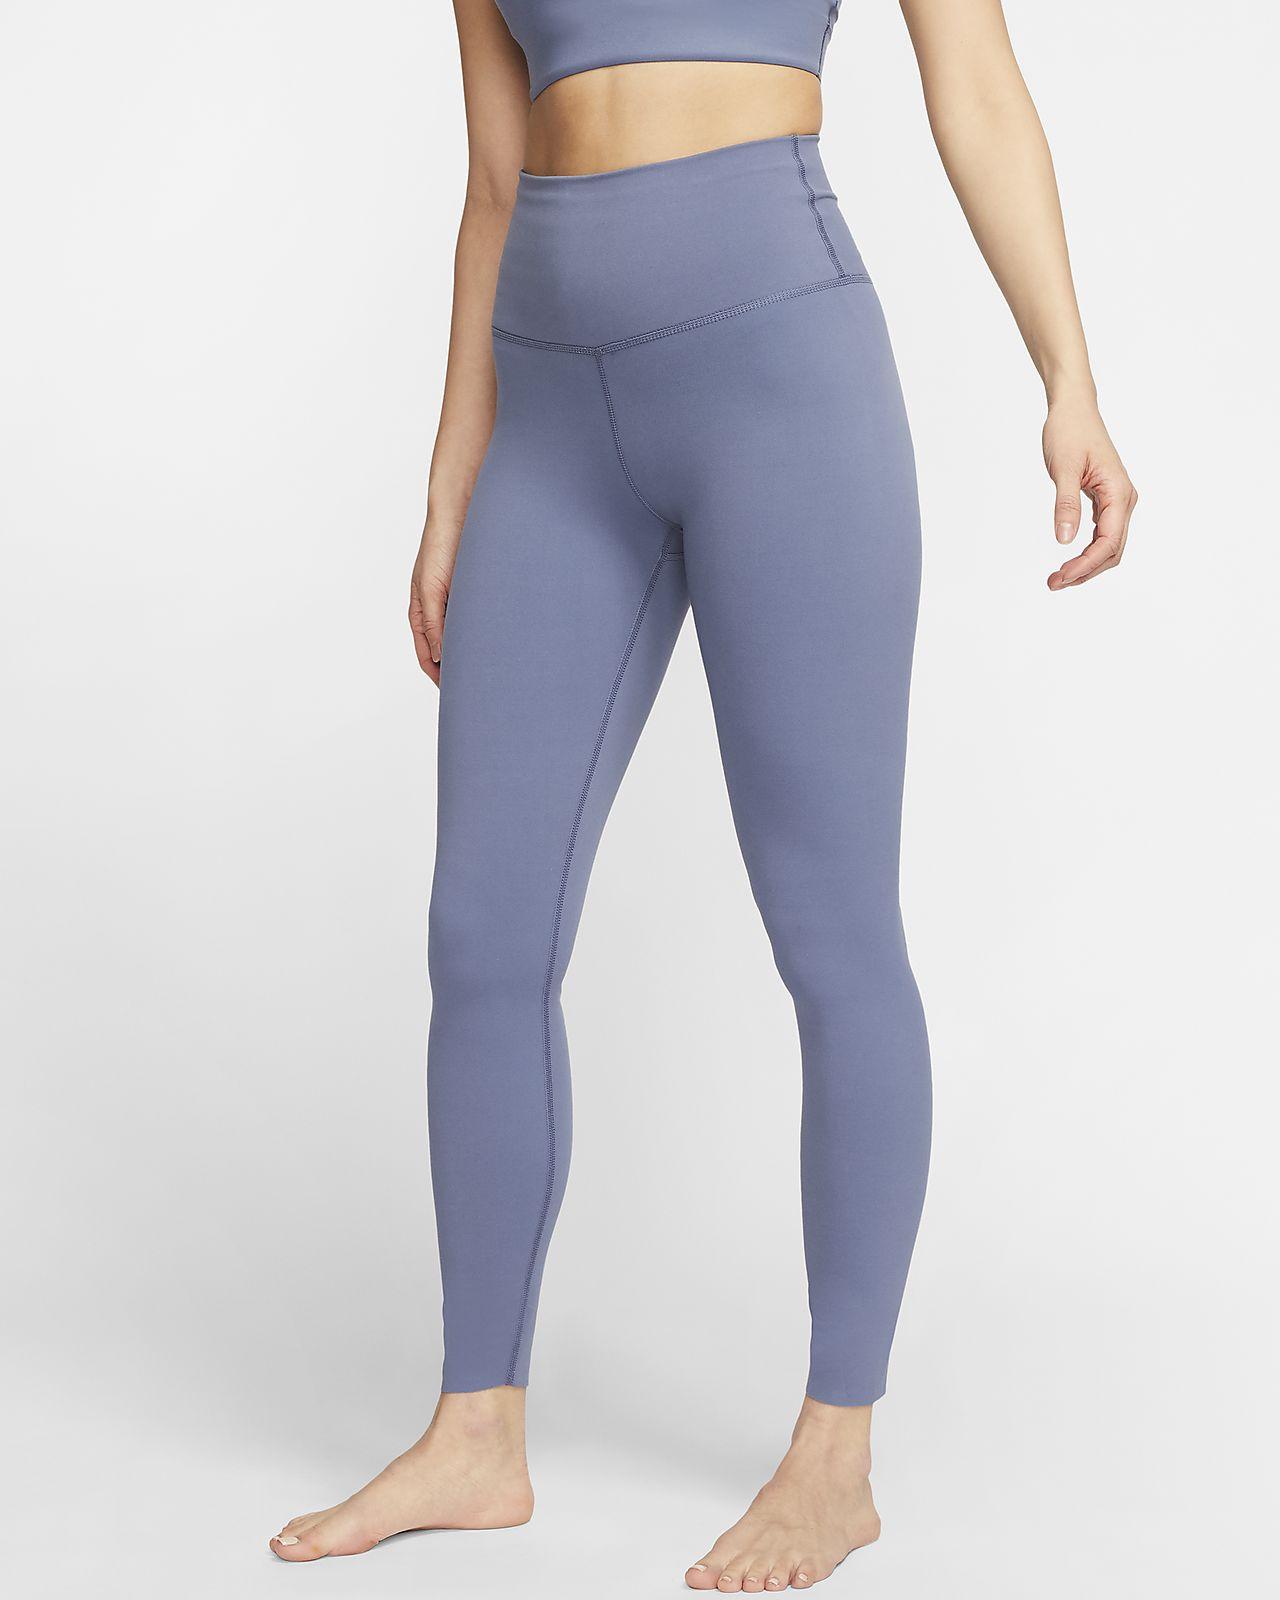 Tights Infinalon a 7/8 Nike Yoga Luxe - Donna